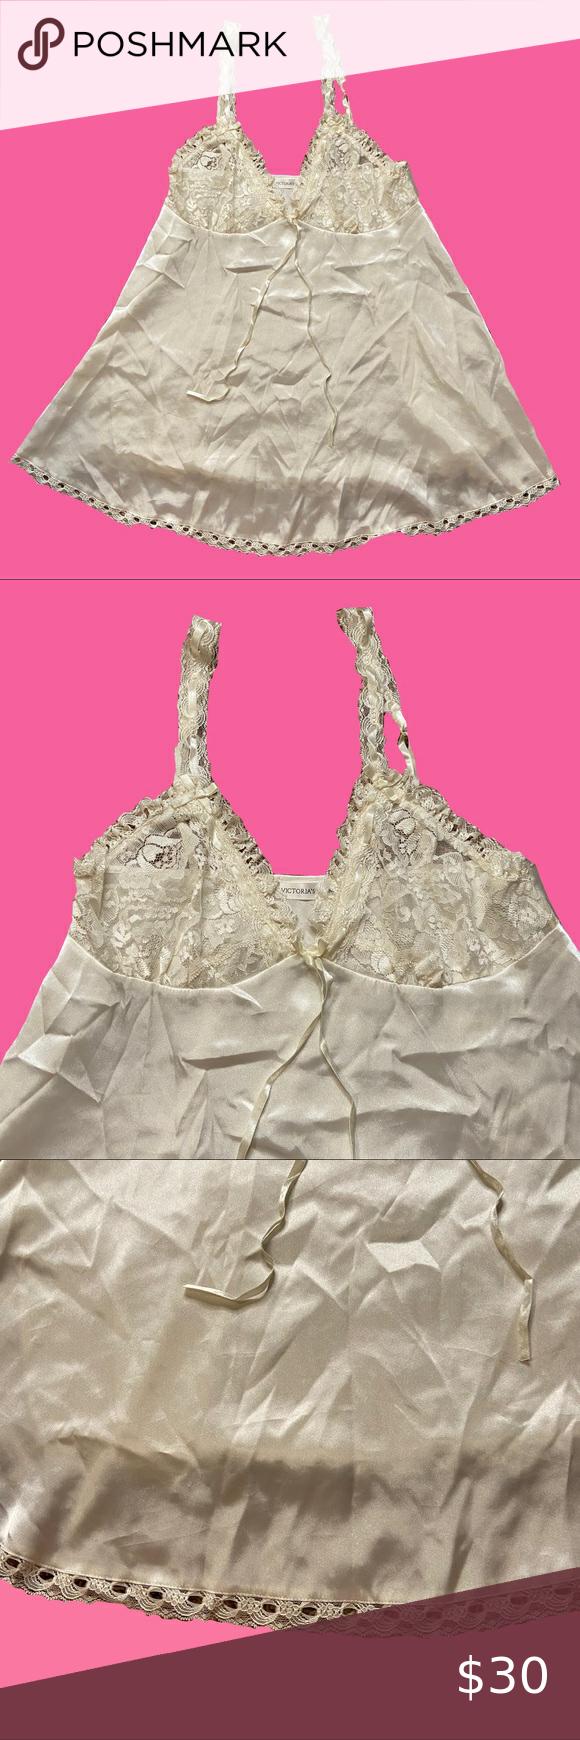 Victories Secret White Lace Slip Dress Victoria Secret White Silk Lace Slip Dress With White Bow Victoria S Secret Intimat Lace Slip Lace Slip Dress Slip Dress [ 1740 x 580 Pixel ]